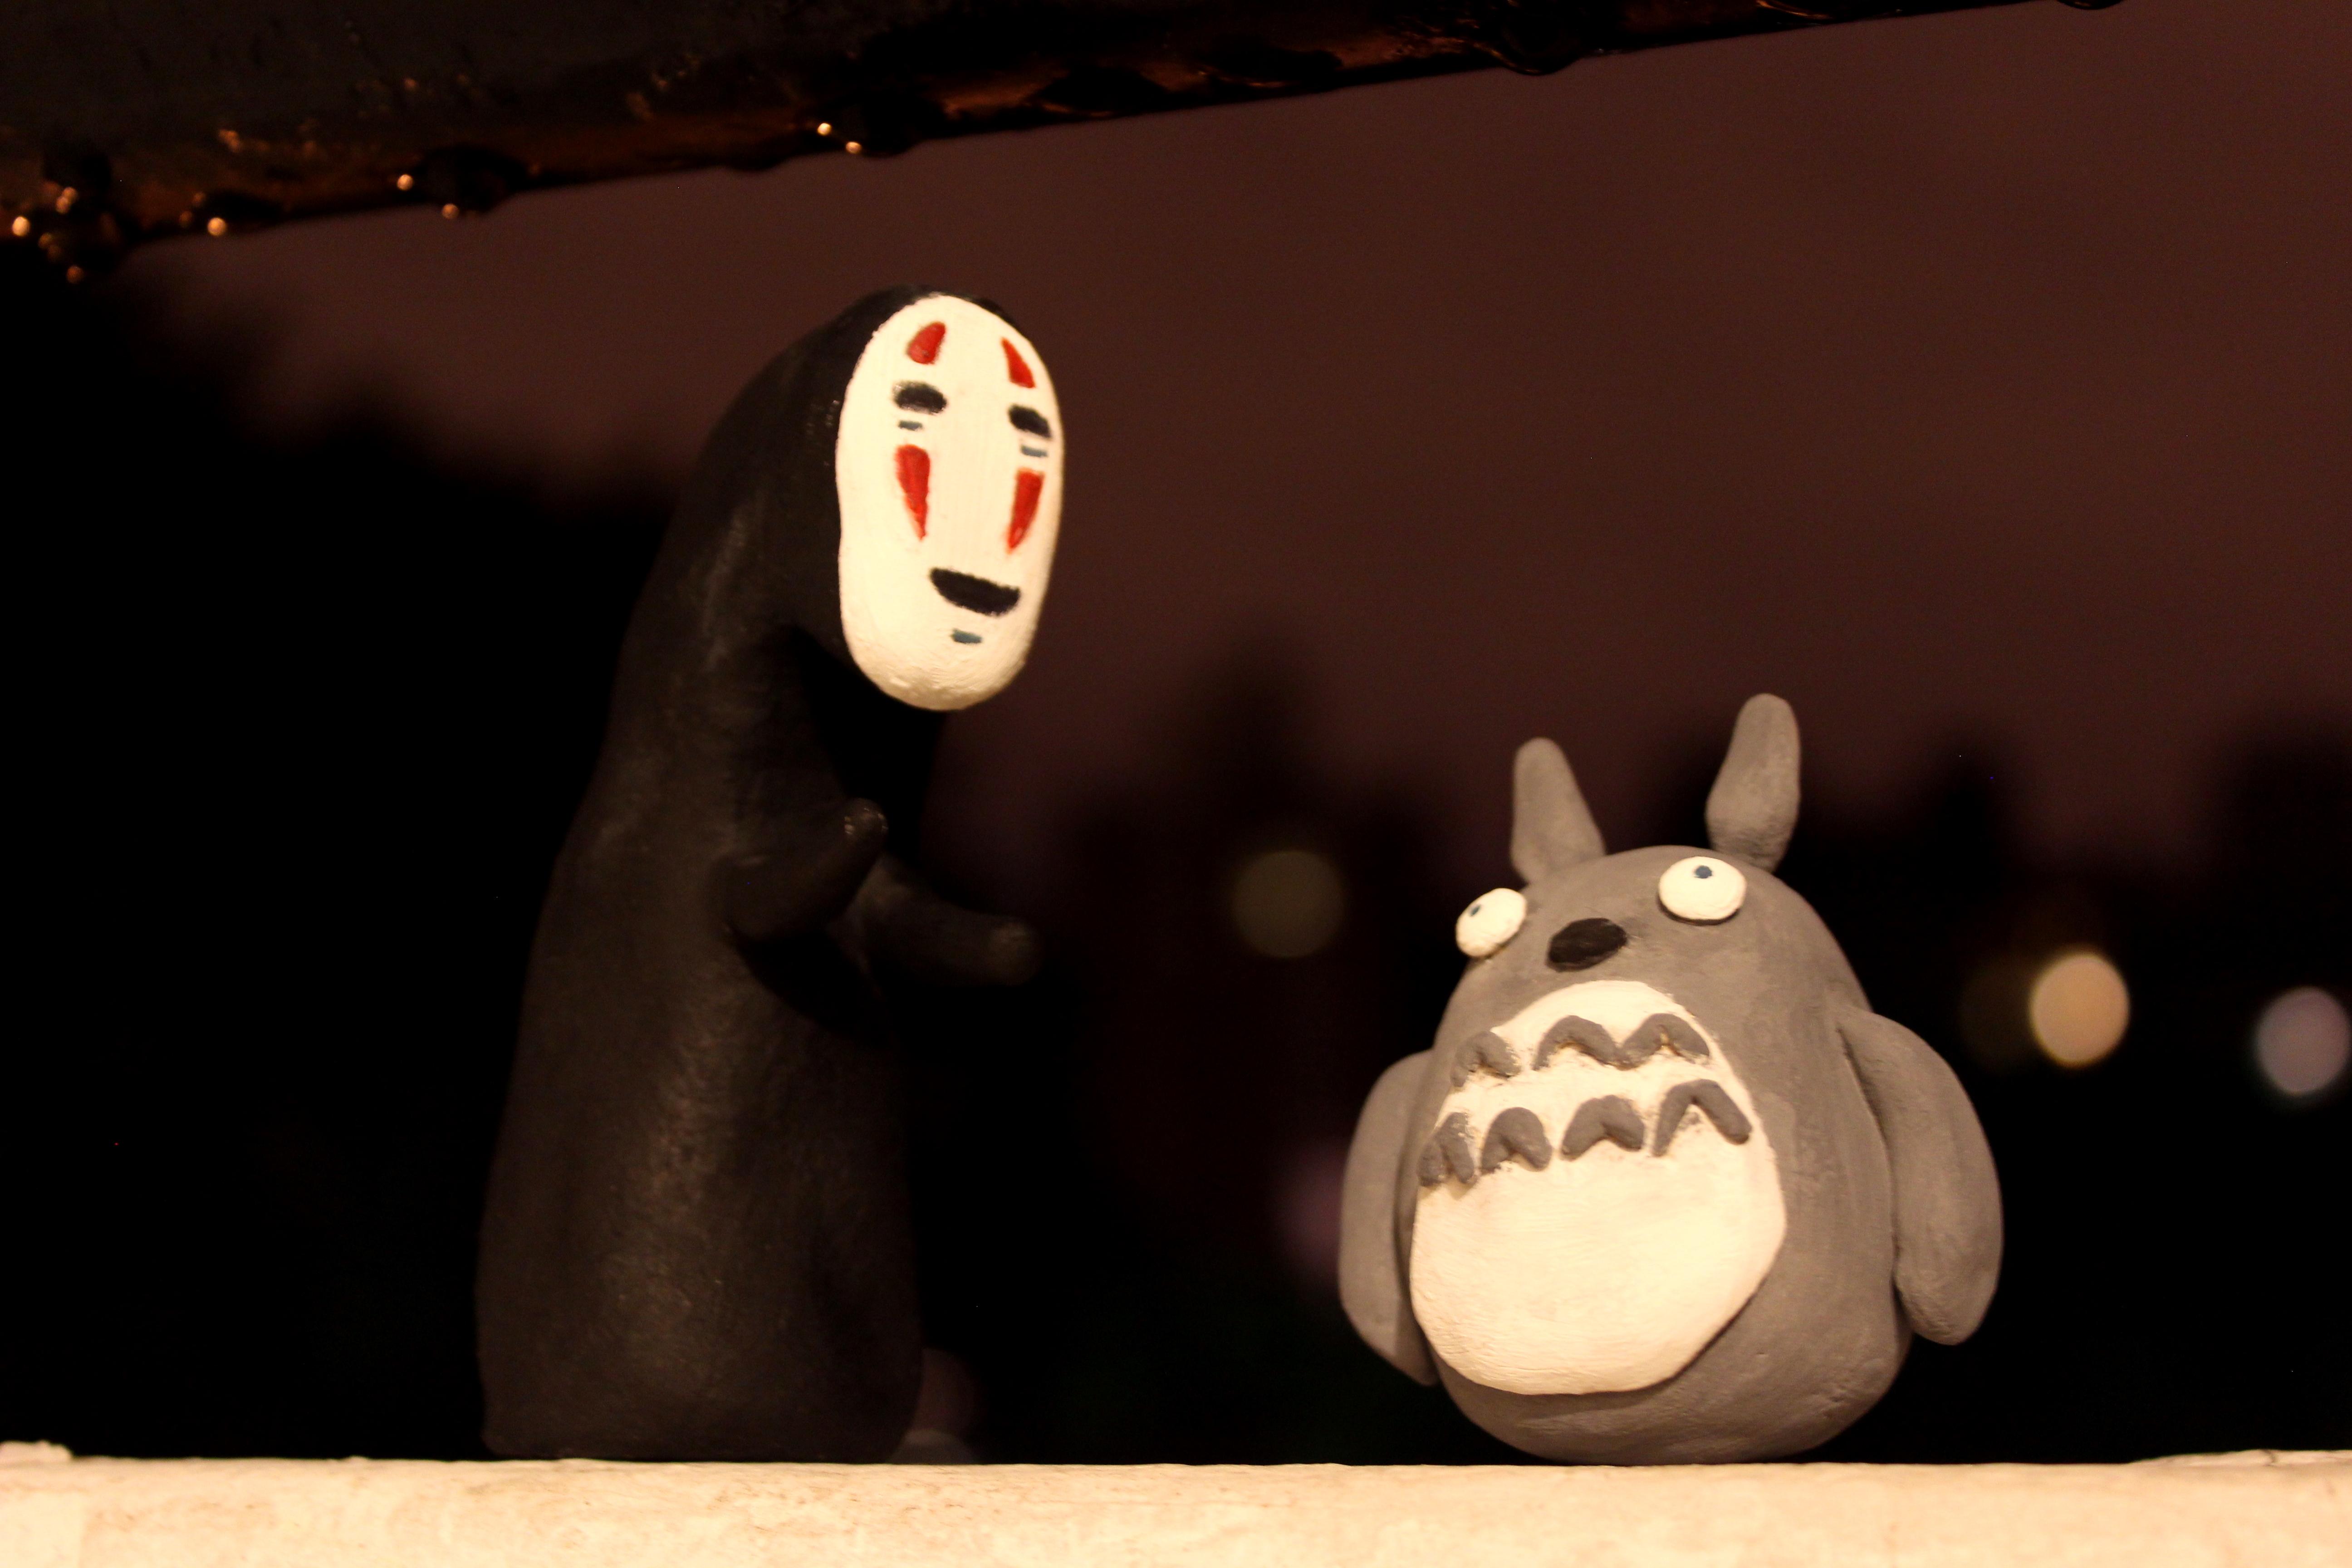 Totoro - Kaonashi (No Face) by westwo0d